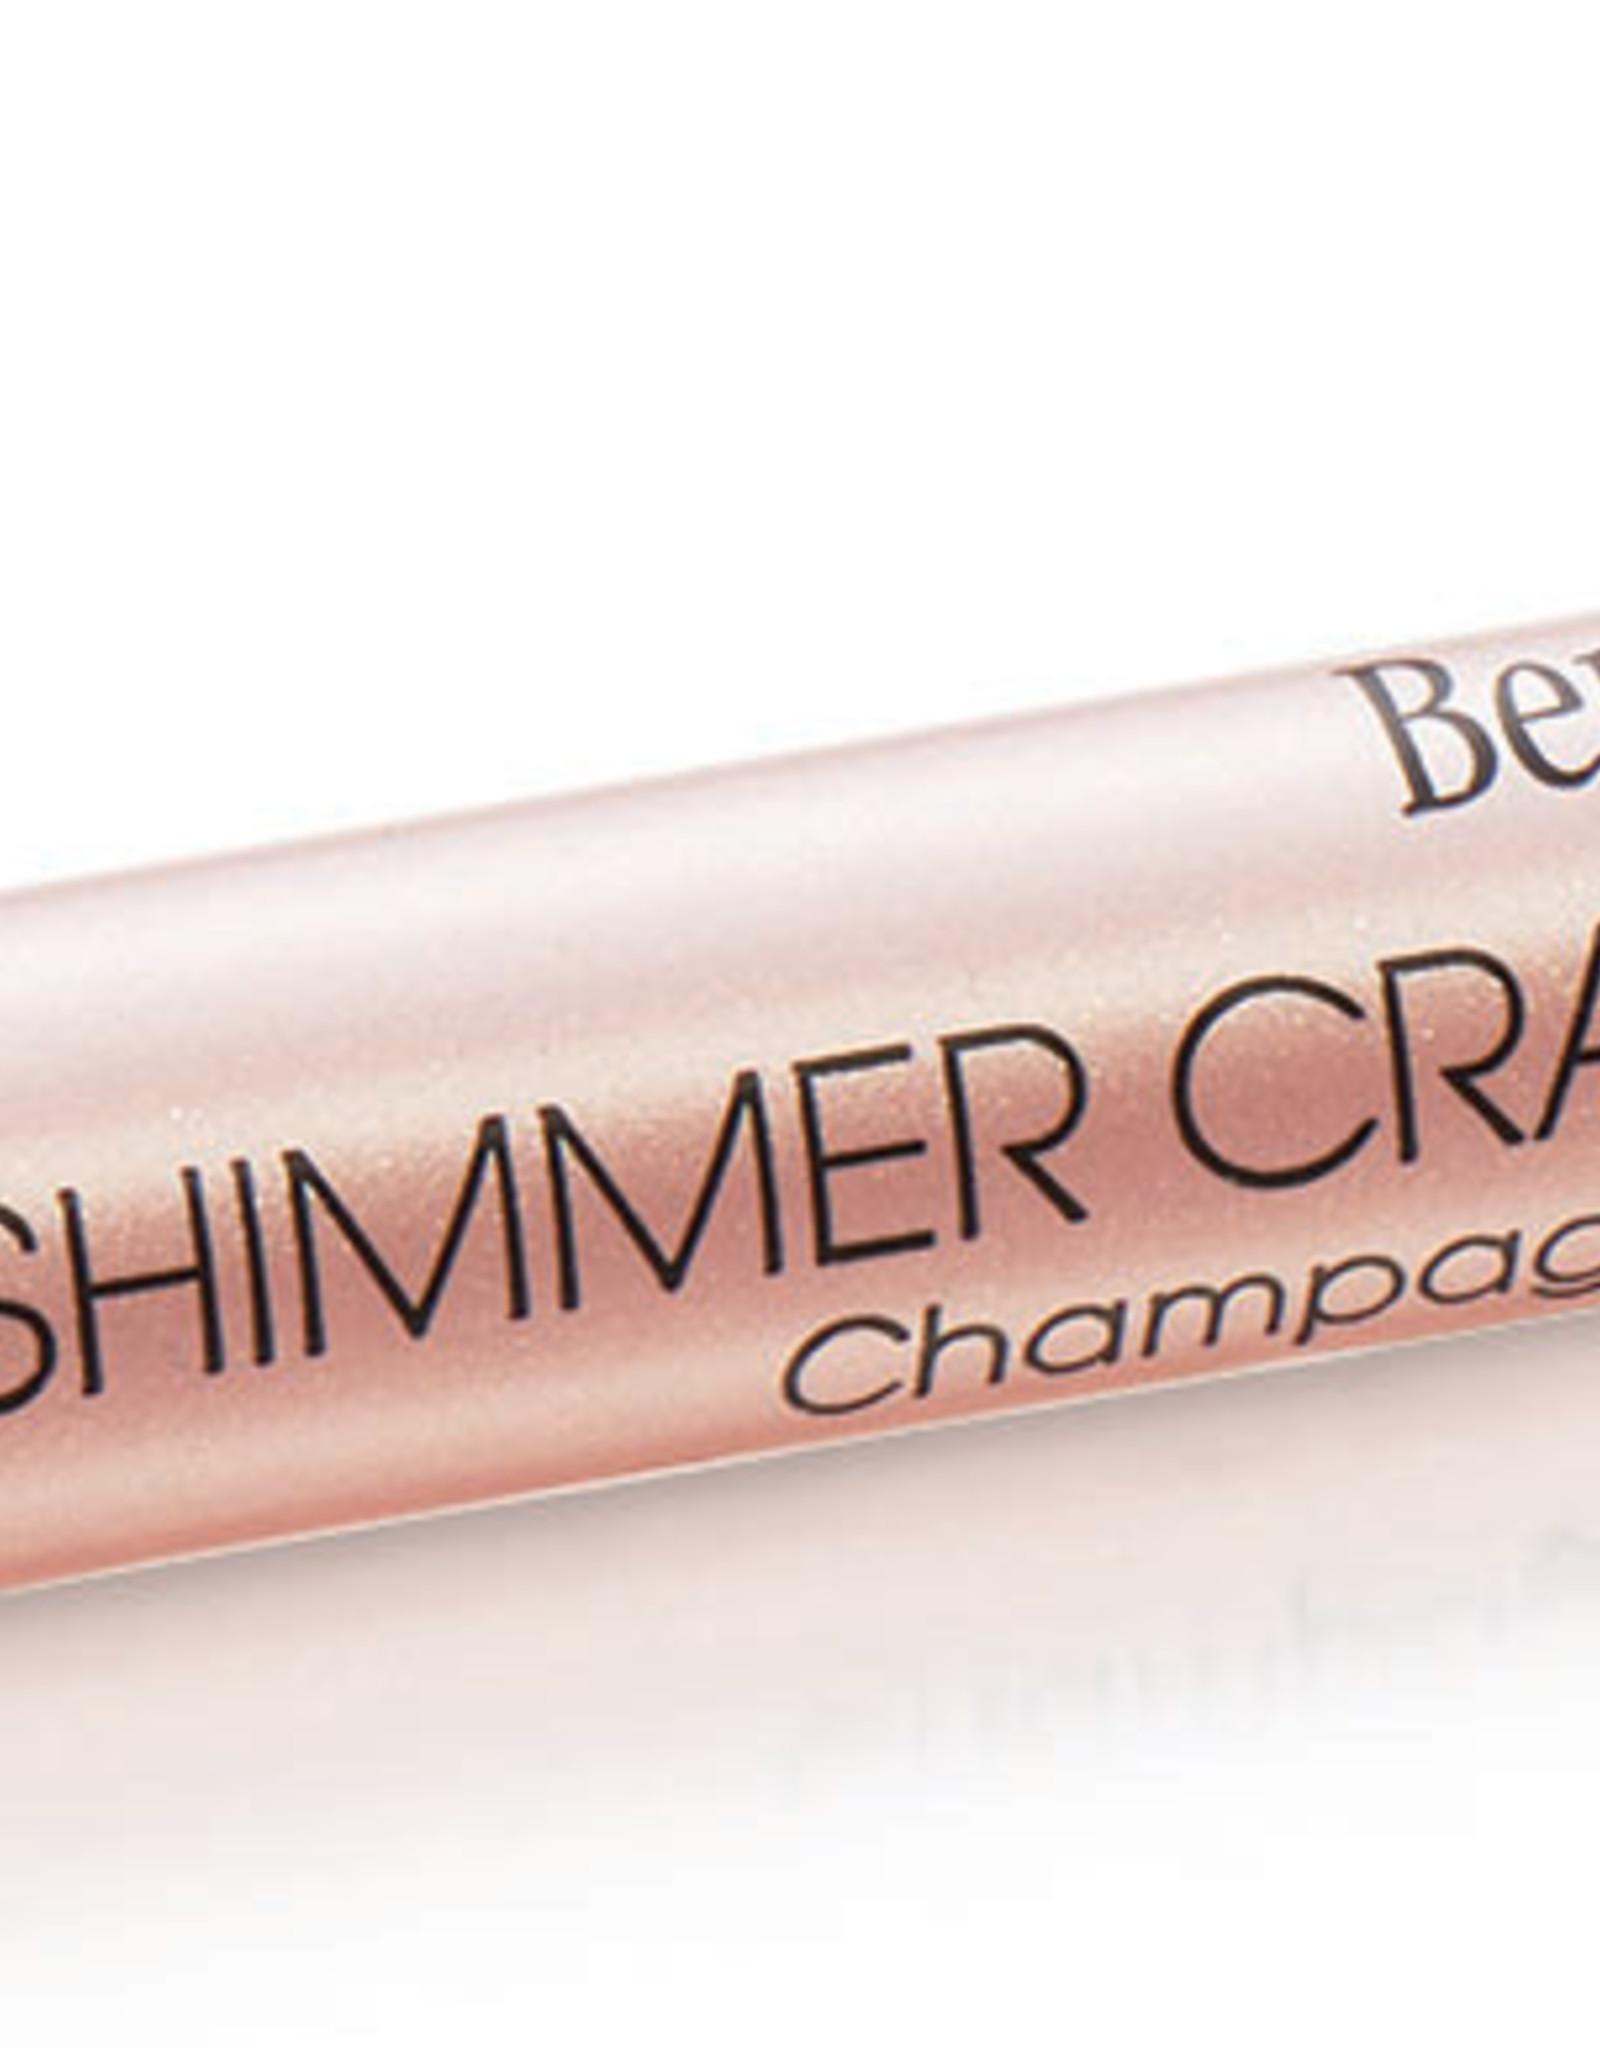 Ben Nye SHIMMER CRAYON, CHAMPAGNE, .10 OZ